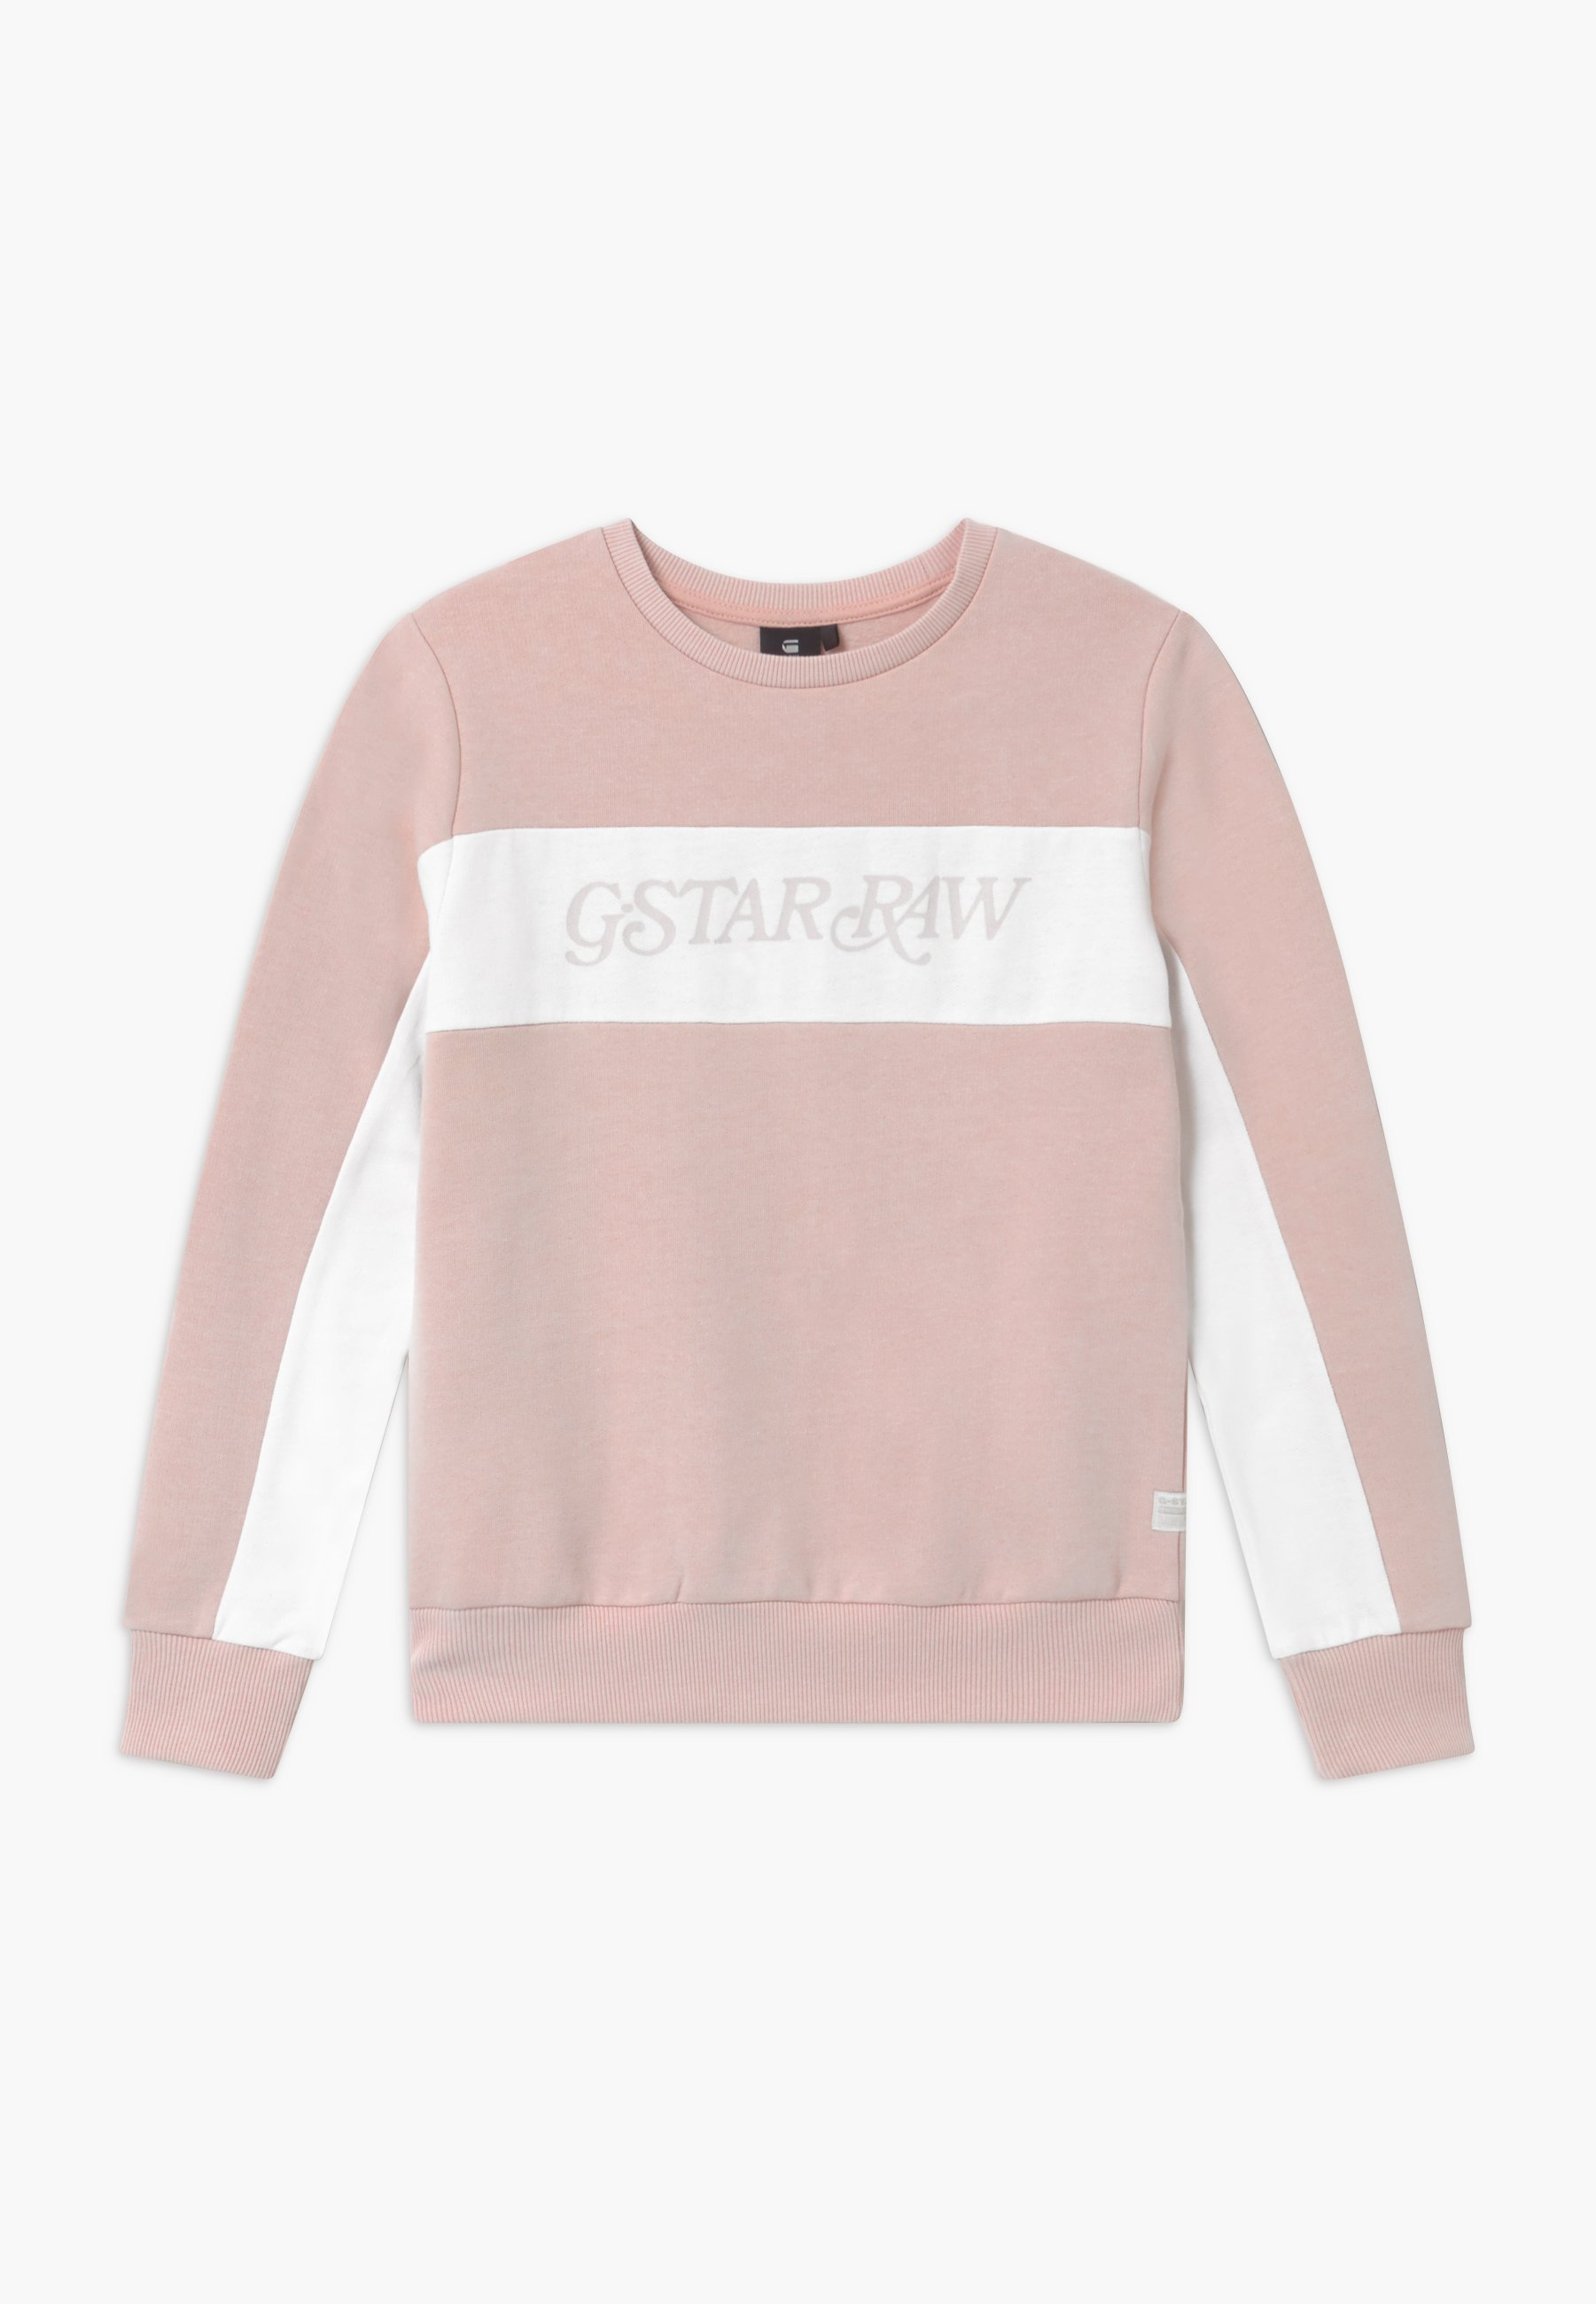 G Star Sweater pinkroze Zalando.nl